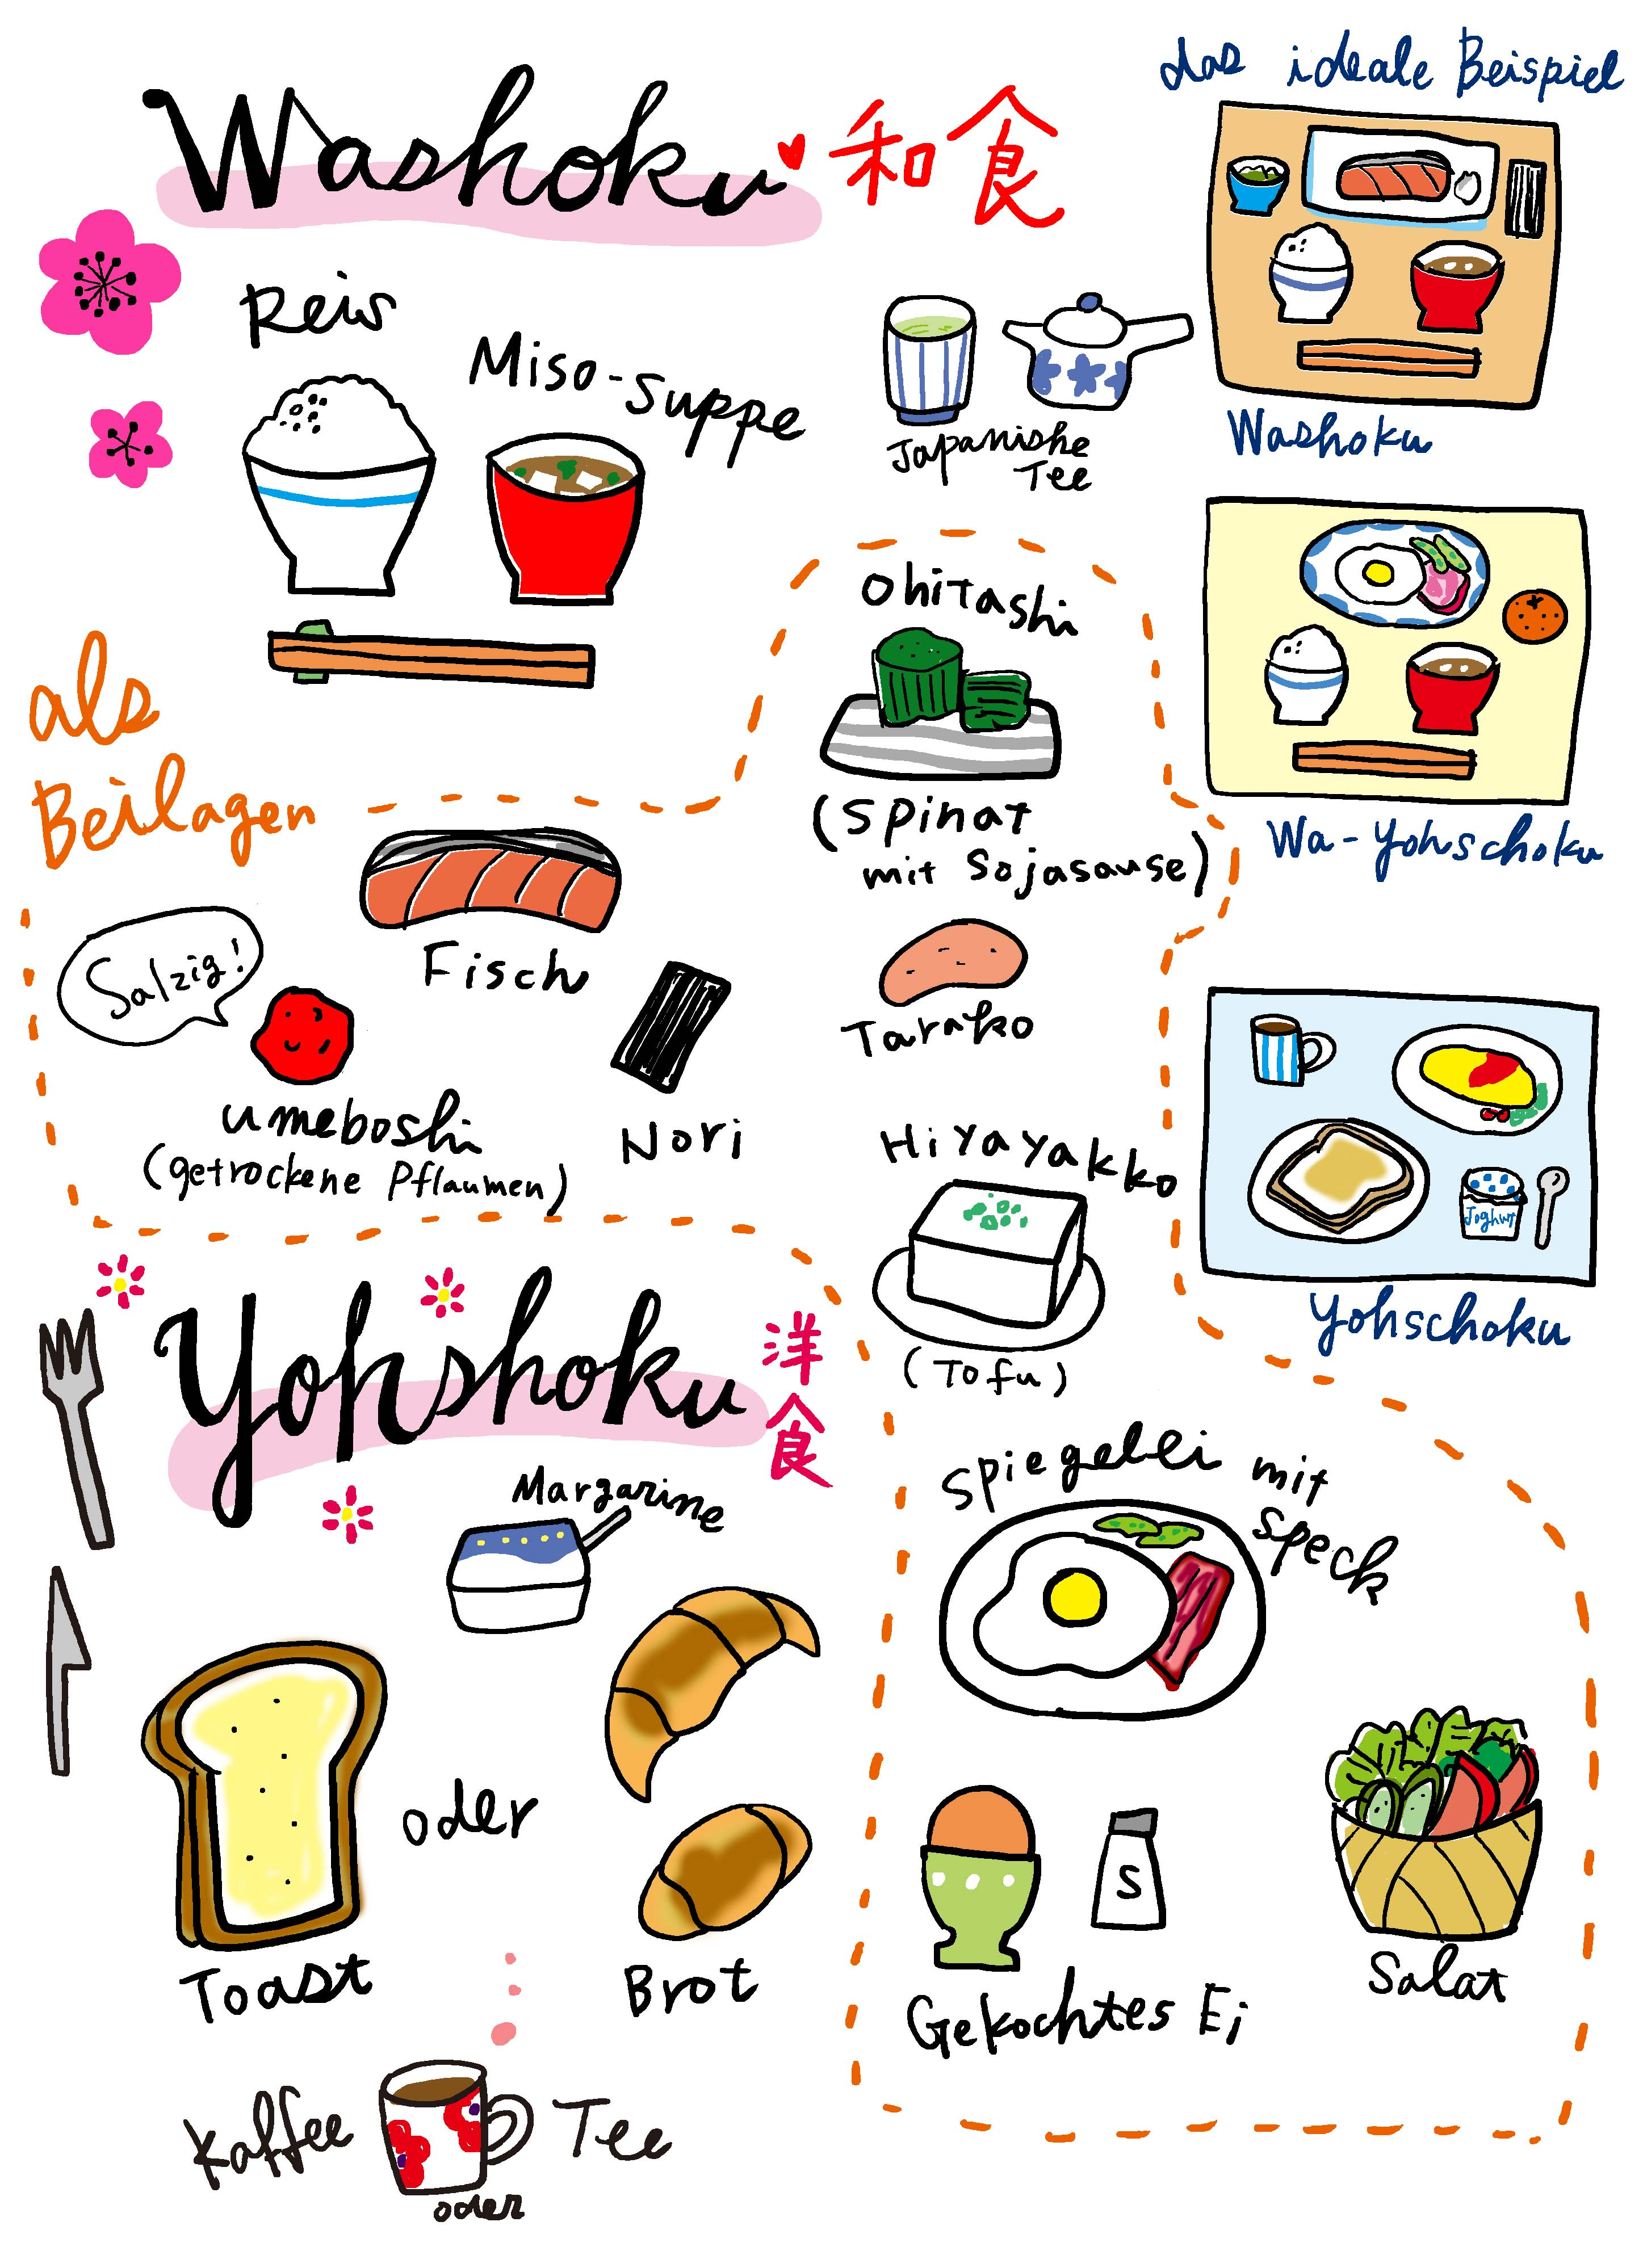 Was isst man eigentlich in Japan?